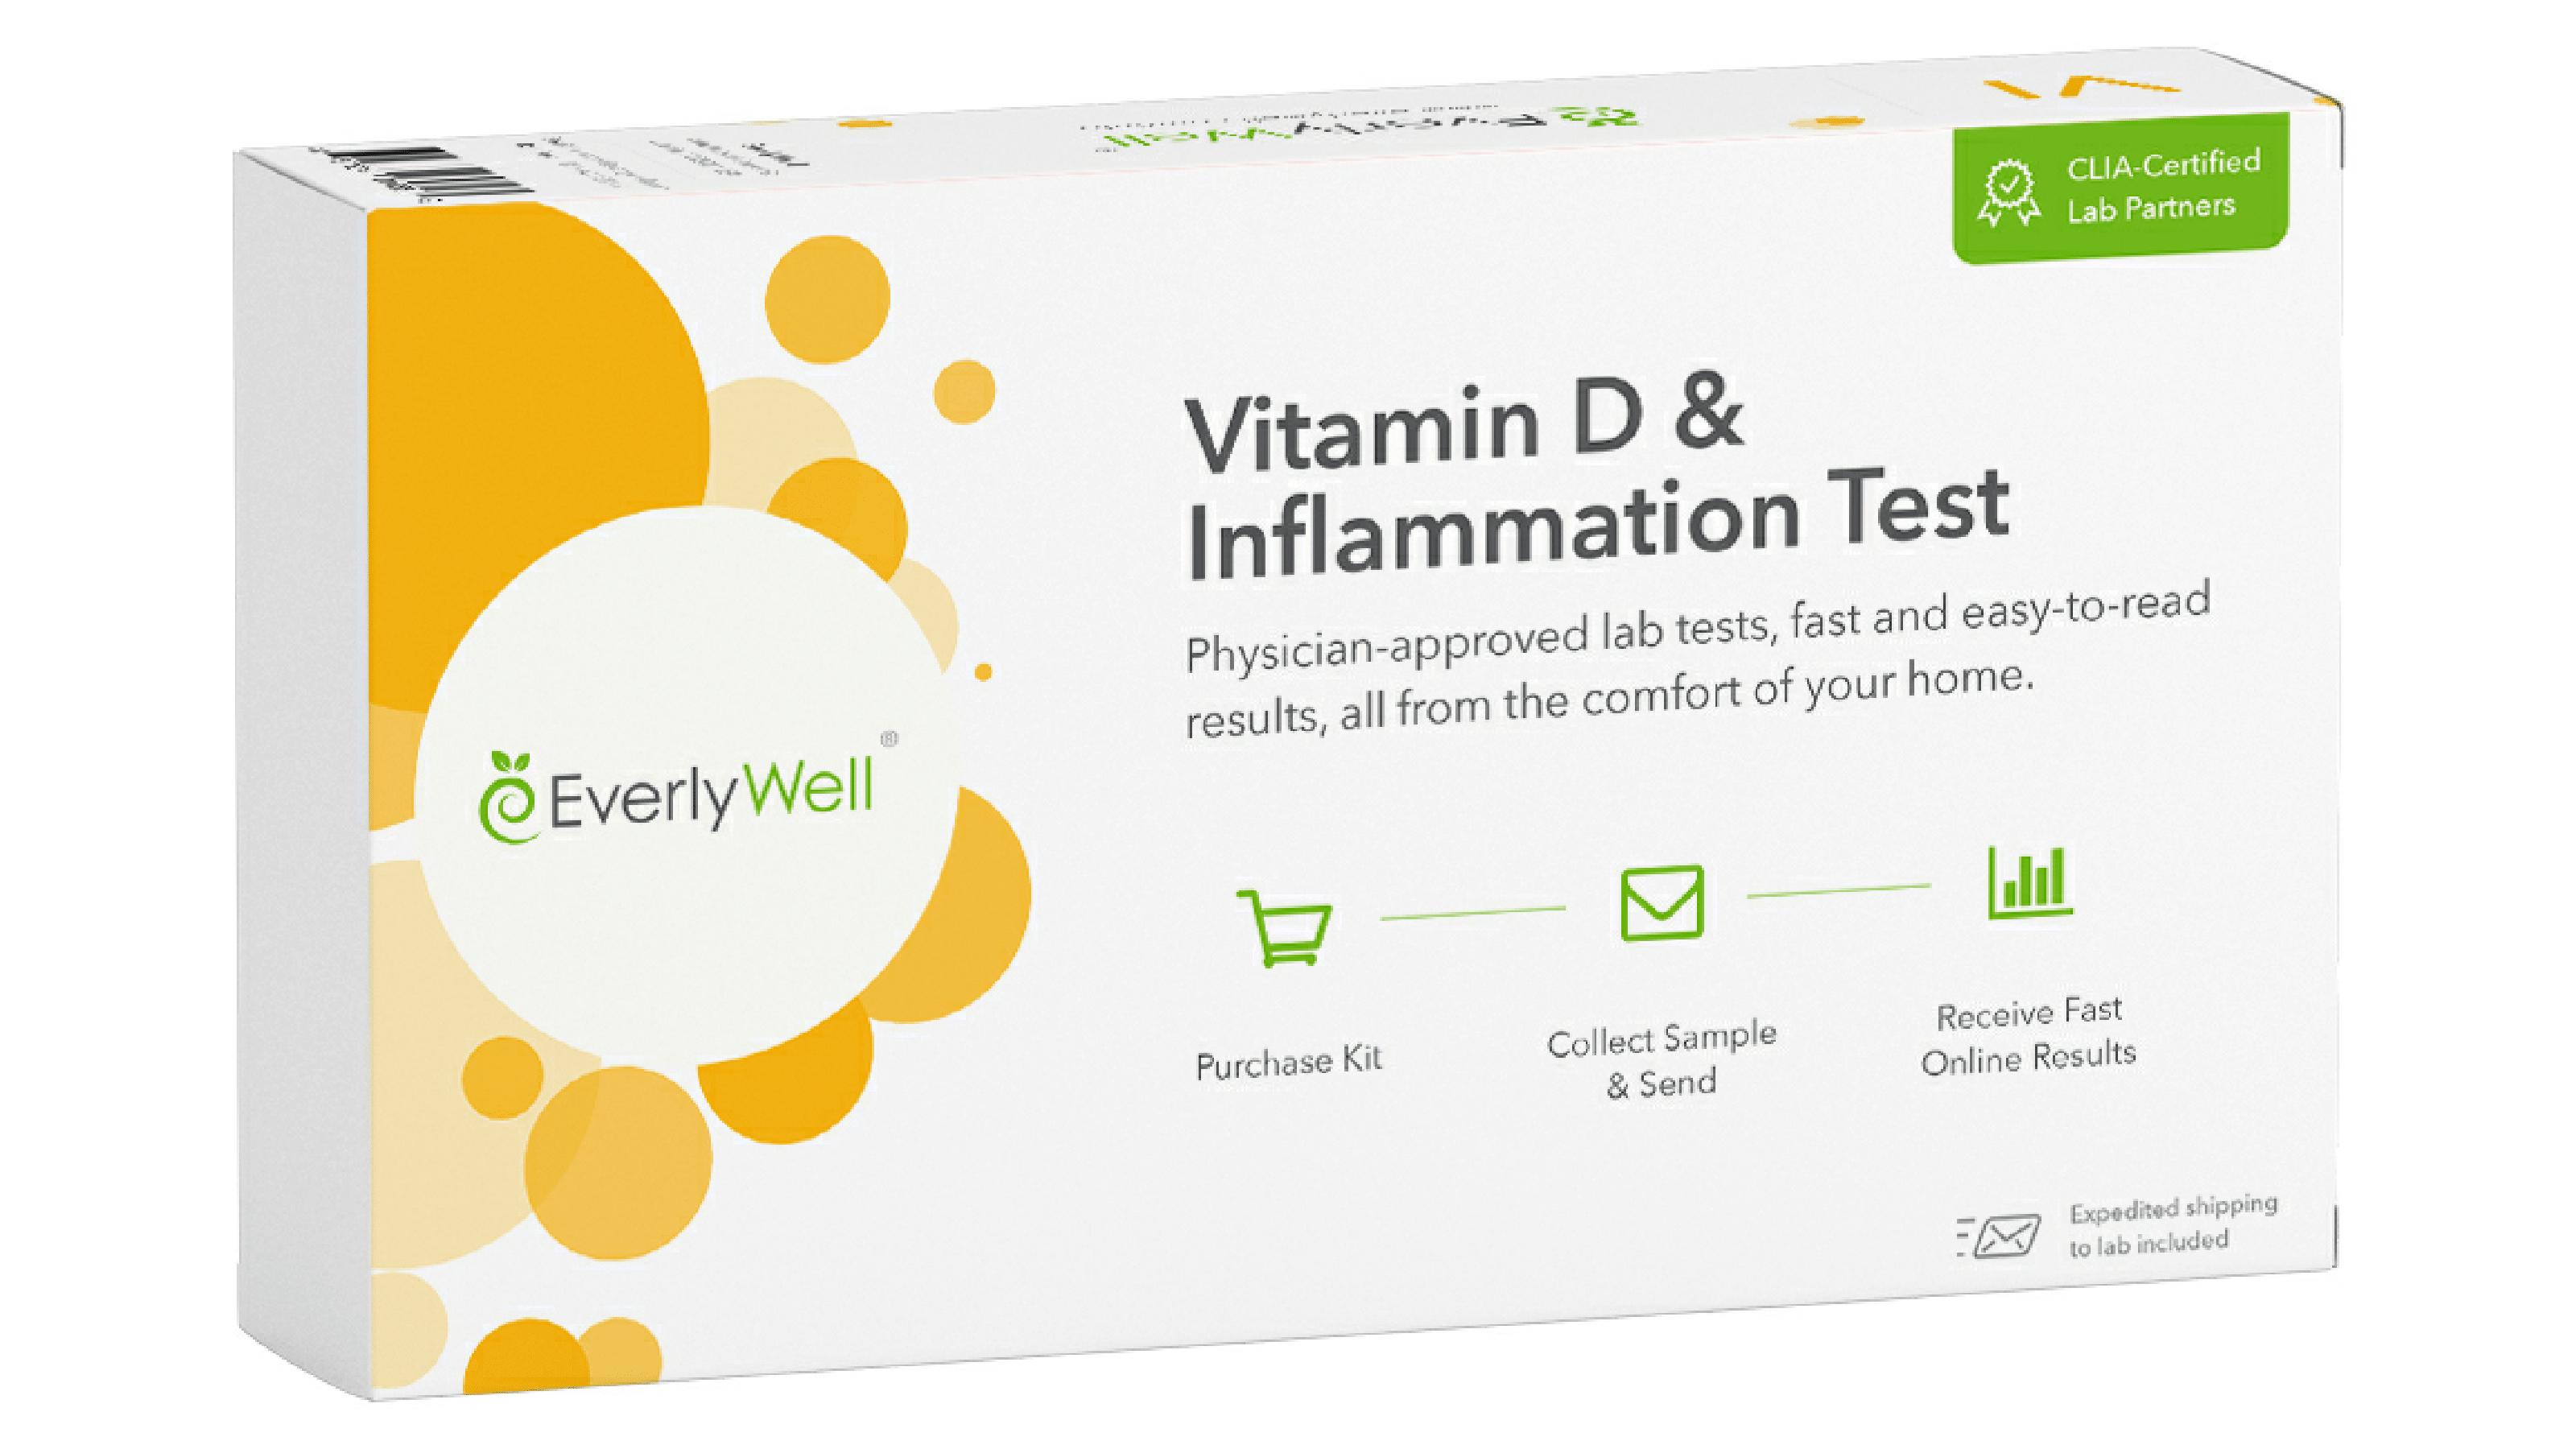 Vitamindinflammationtest9x1612